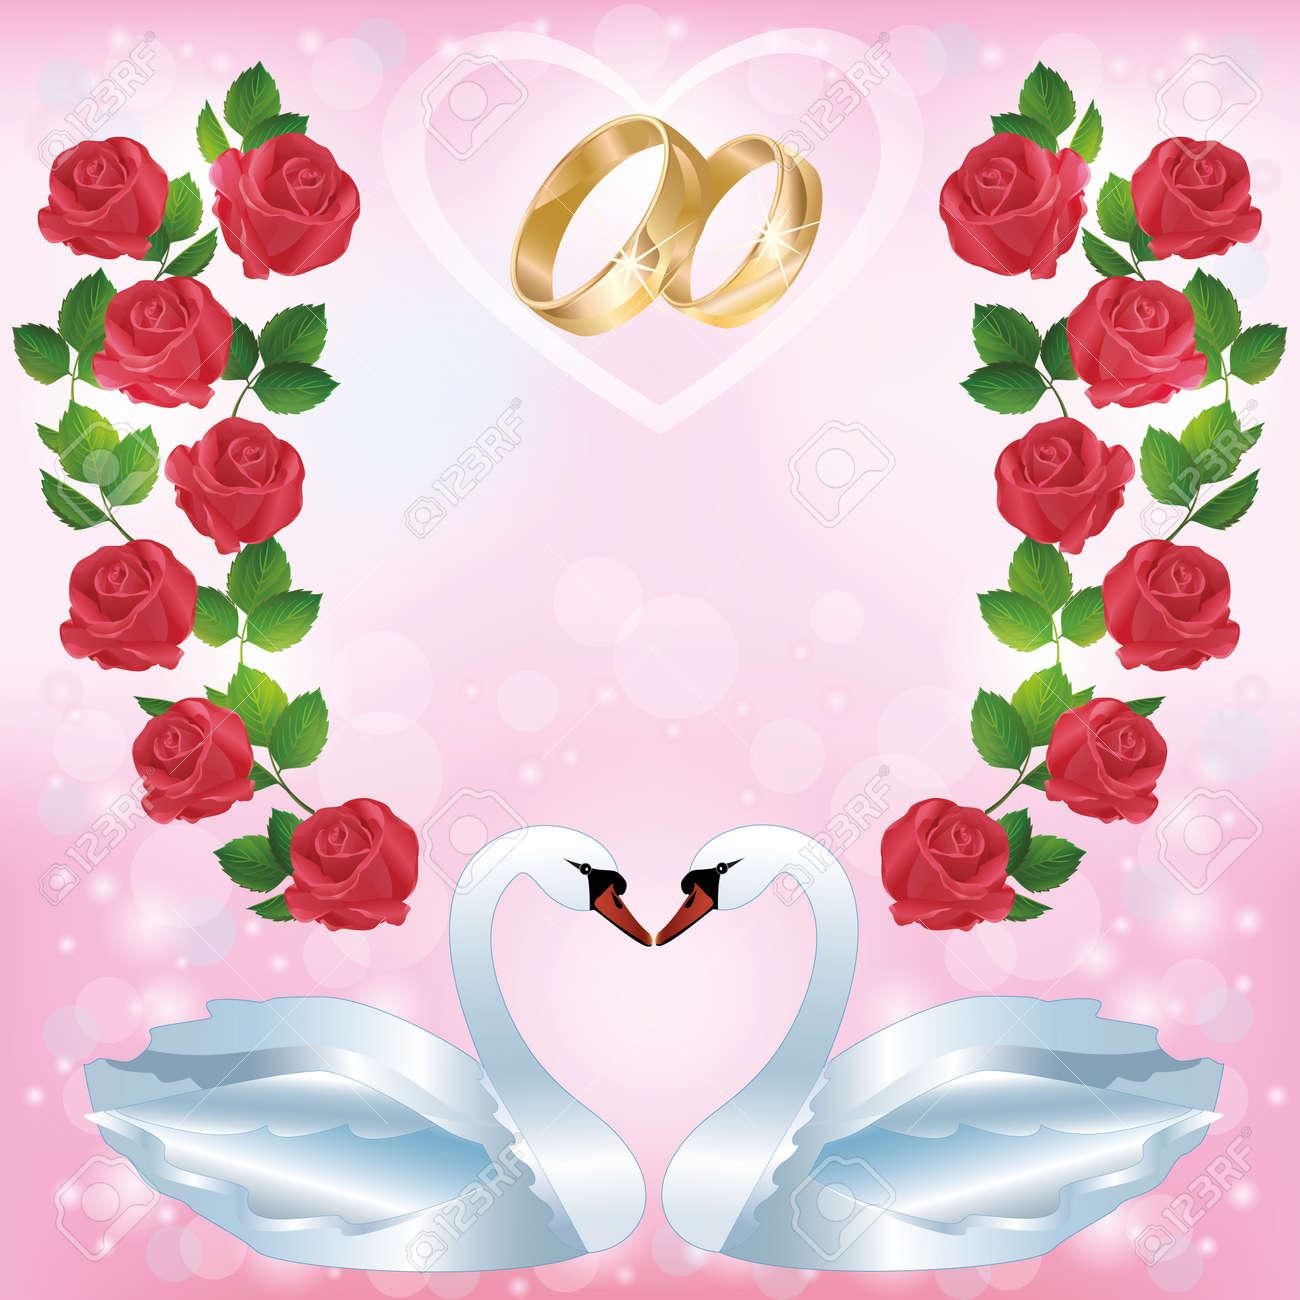 d9d03e14d0f5 Boda de felicitación o tarjeta de invitación con un par de cisnes blancos